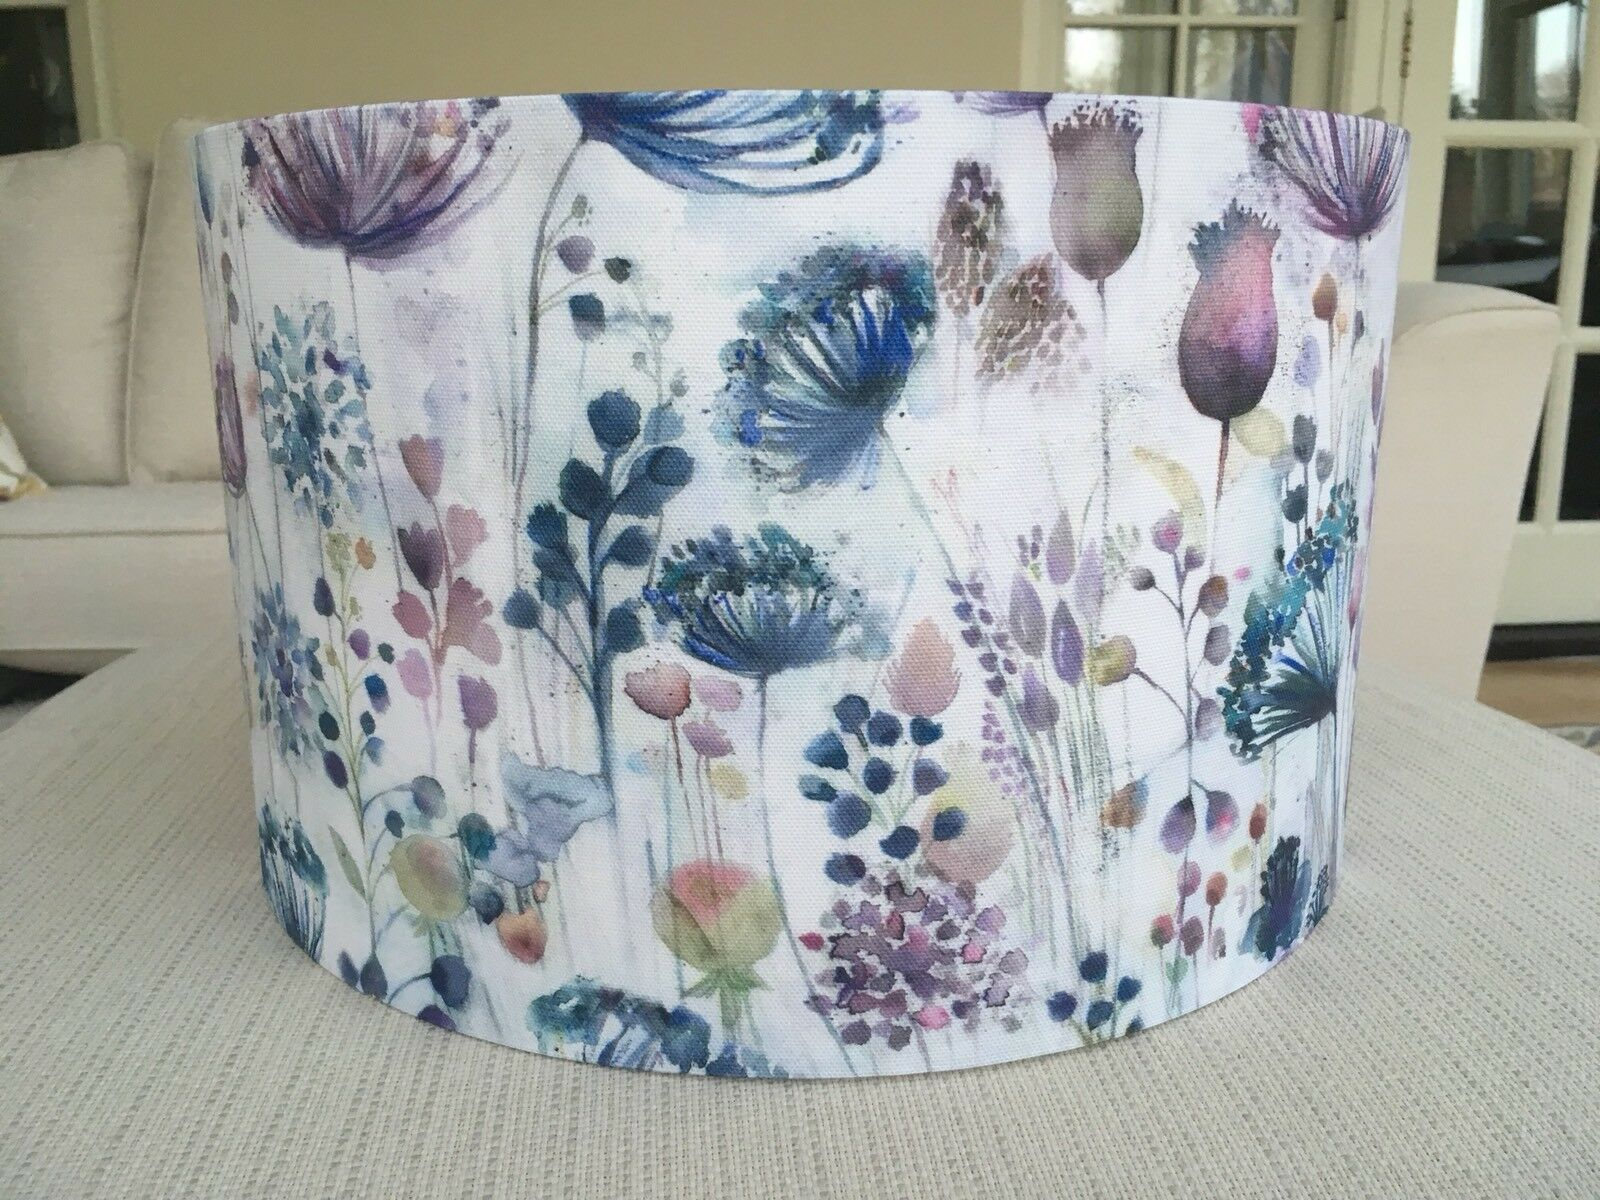 New Handmade Lampshade Voyage Maison Meadow Seedheads Fabric lila Blau Cream